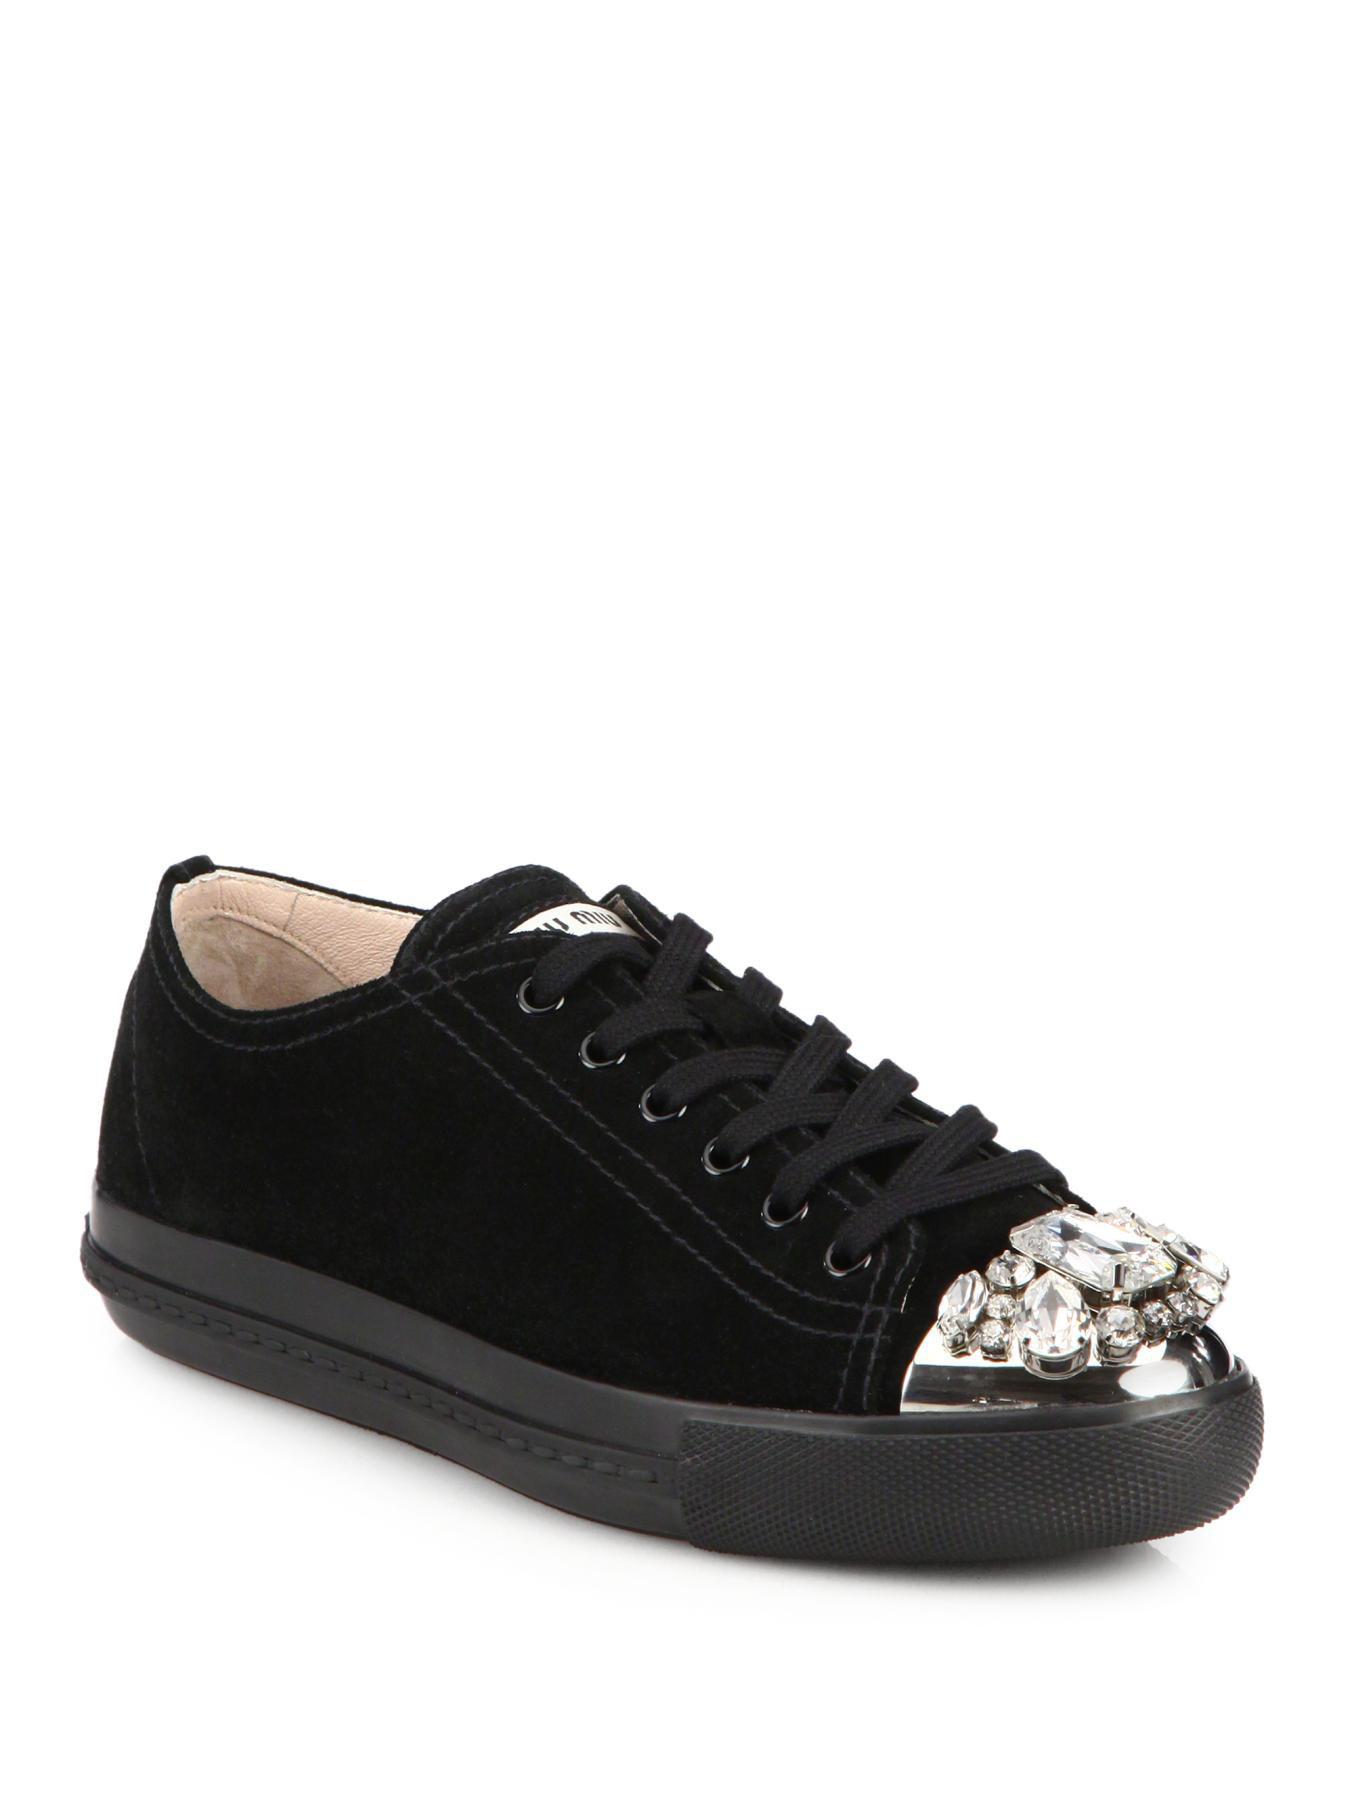 Lyst - Miu Miu Suede Swarovski Crystal Lowtop Sneakers in Metallic c829a6441e53